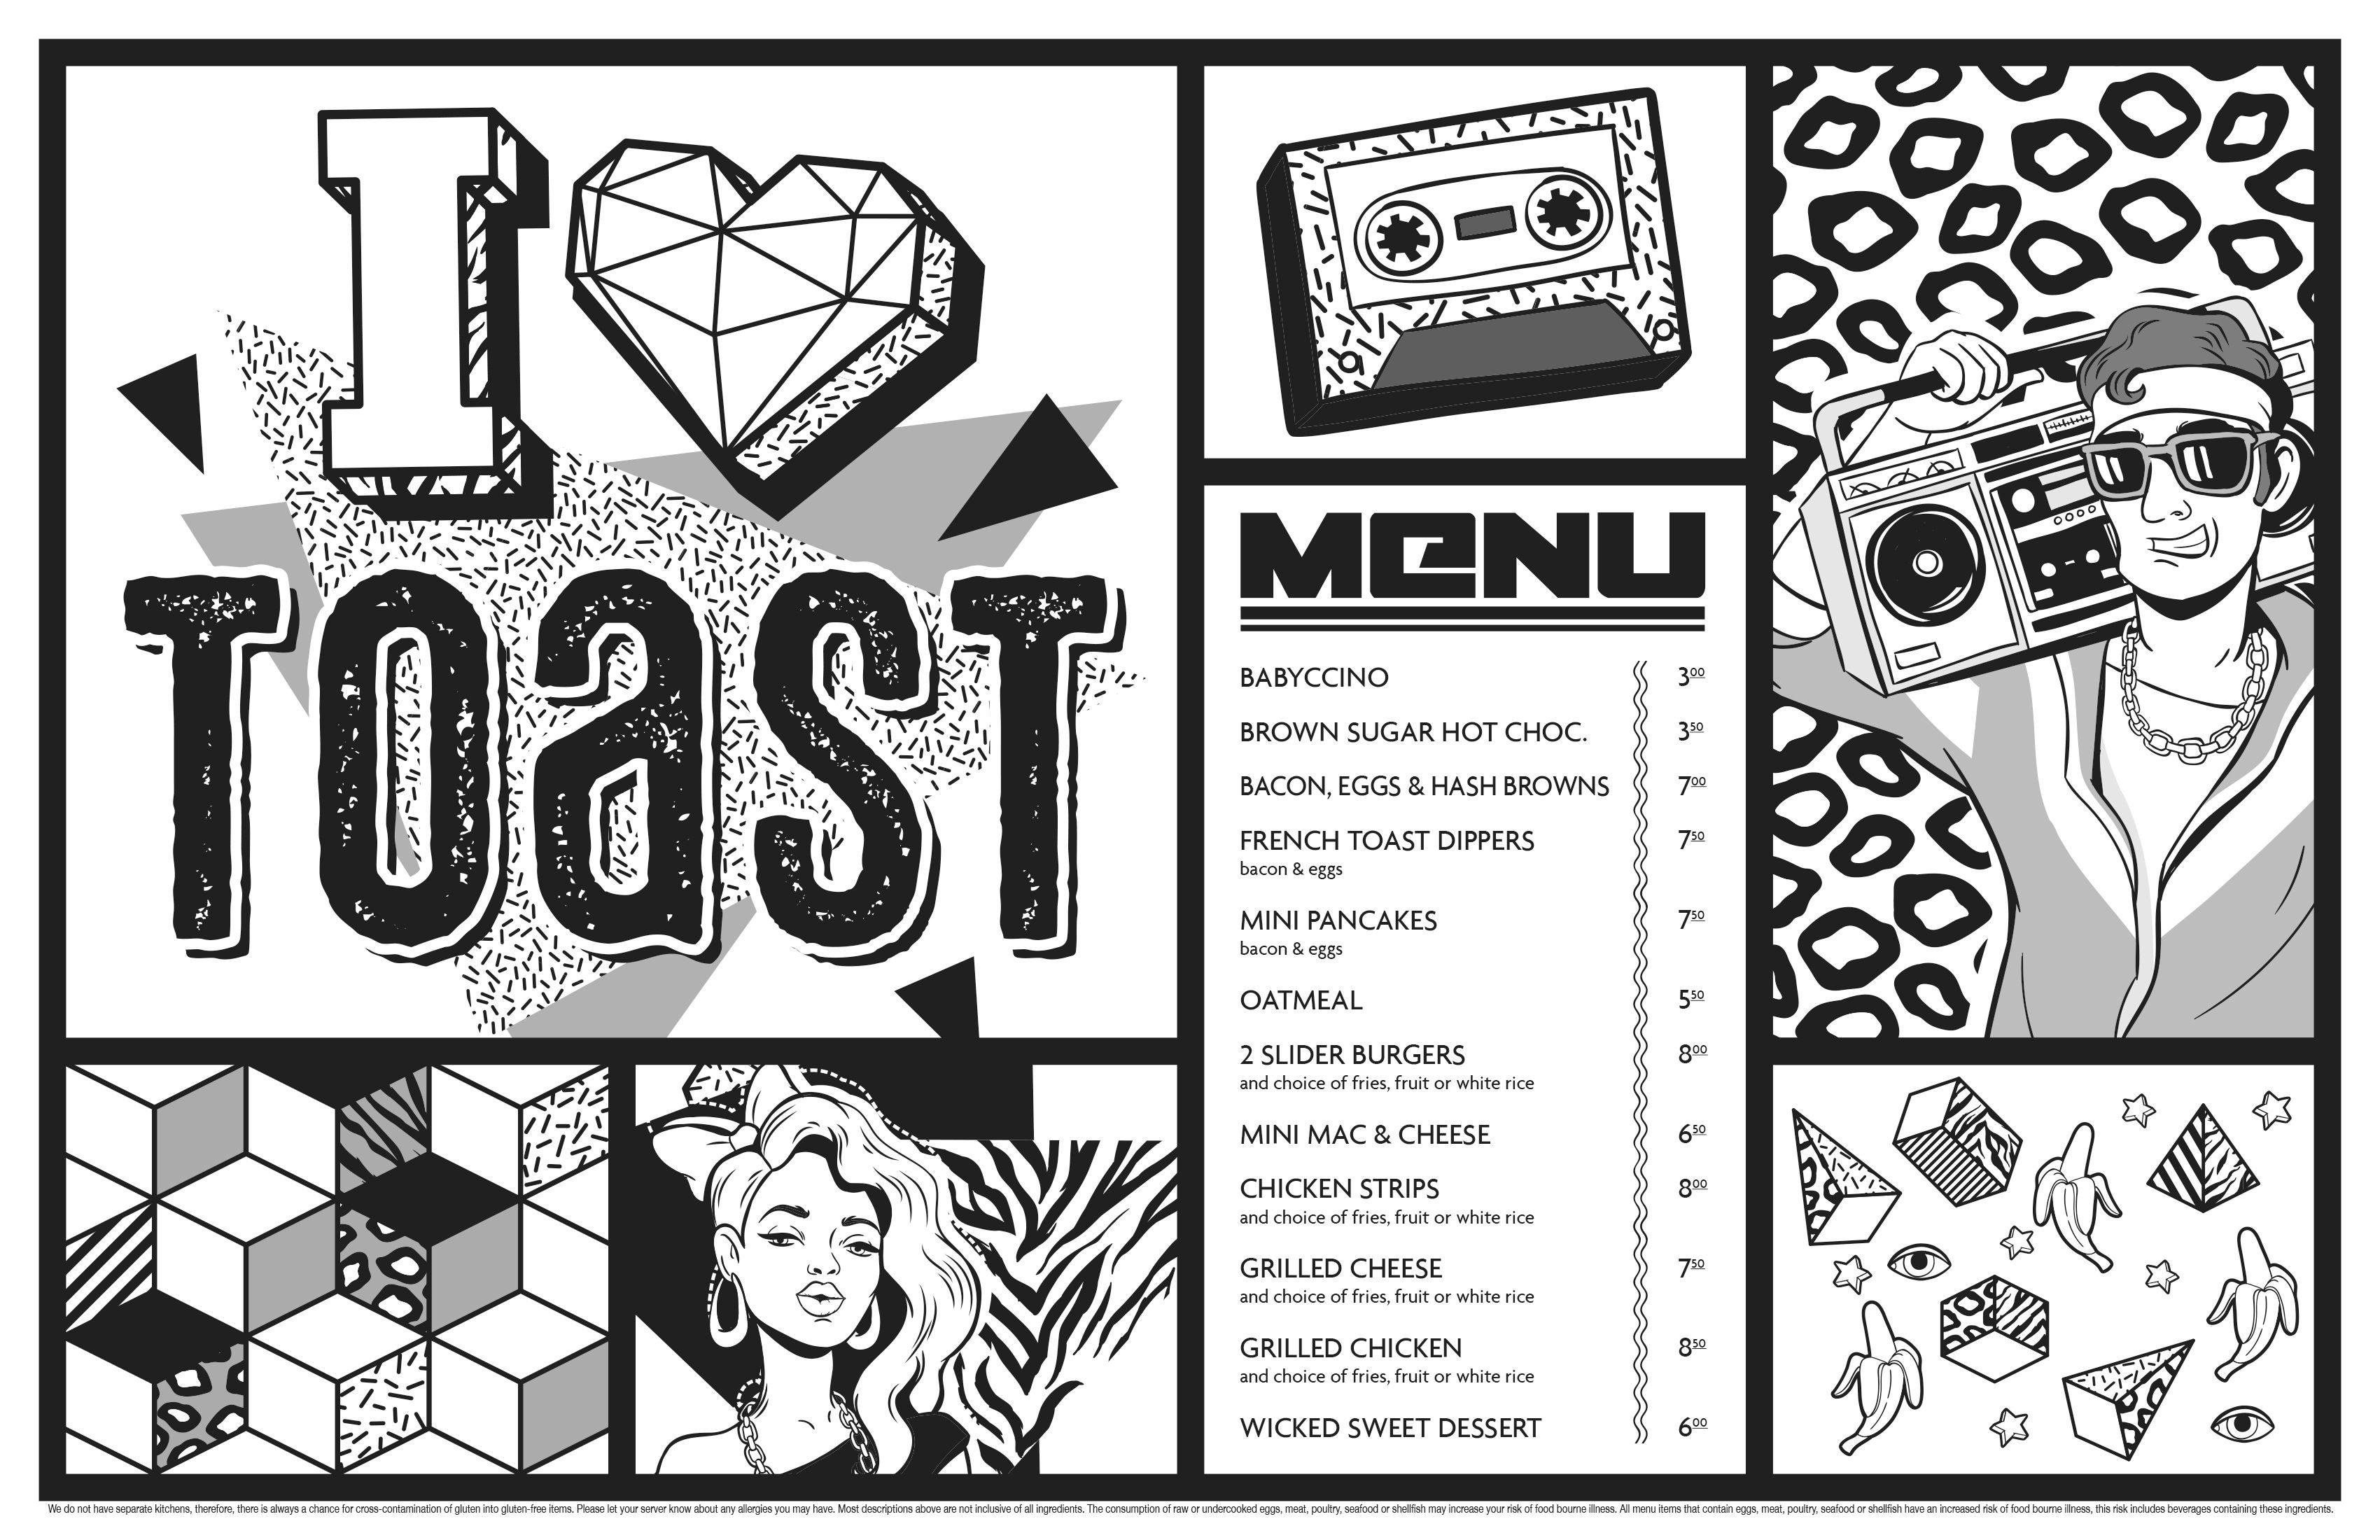 Toast Kids Menu.jpg